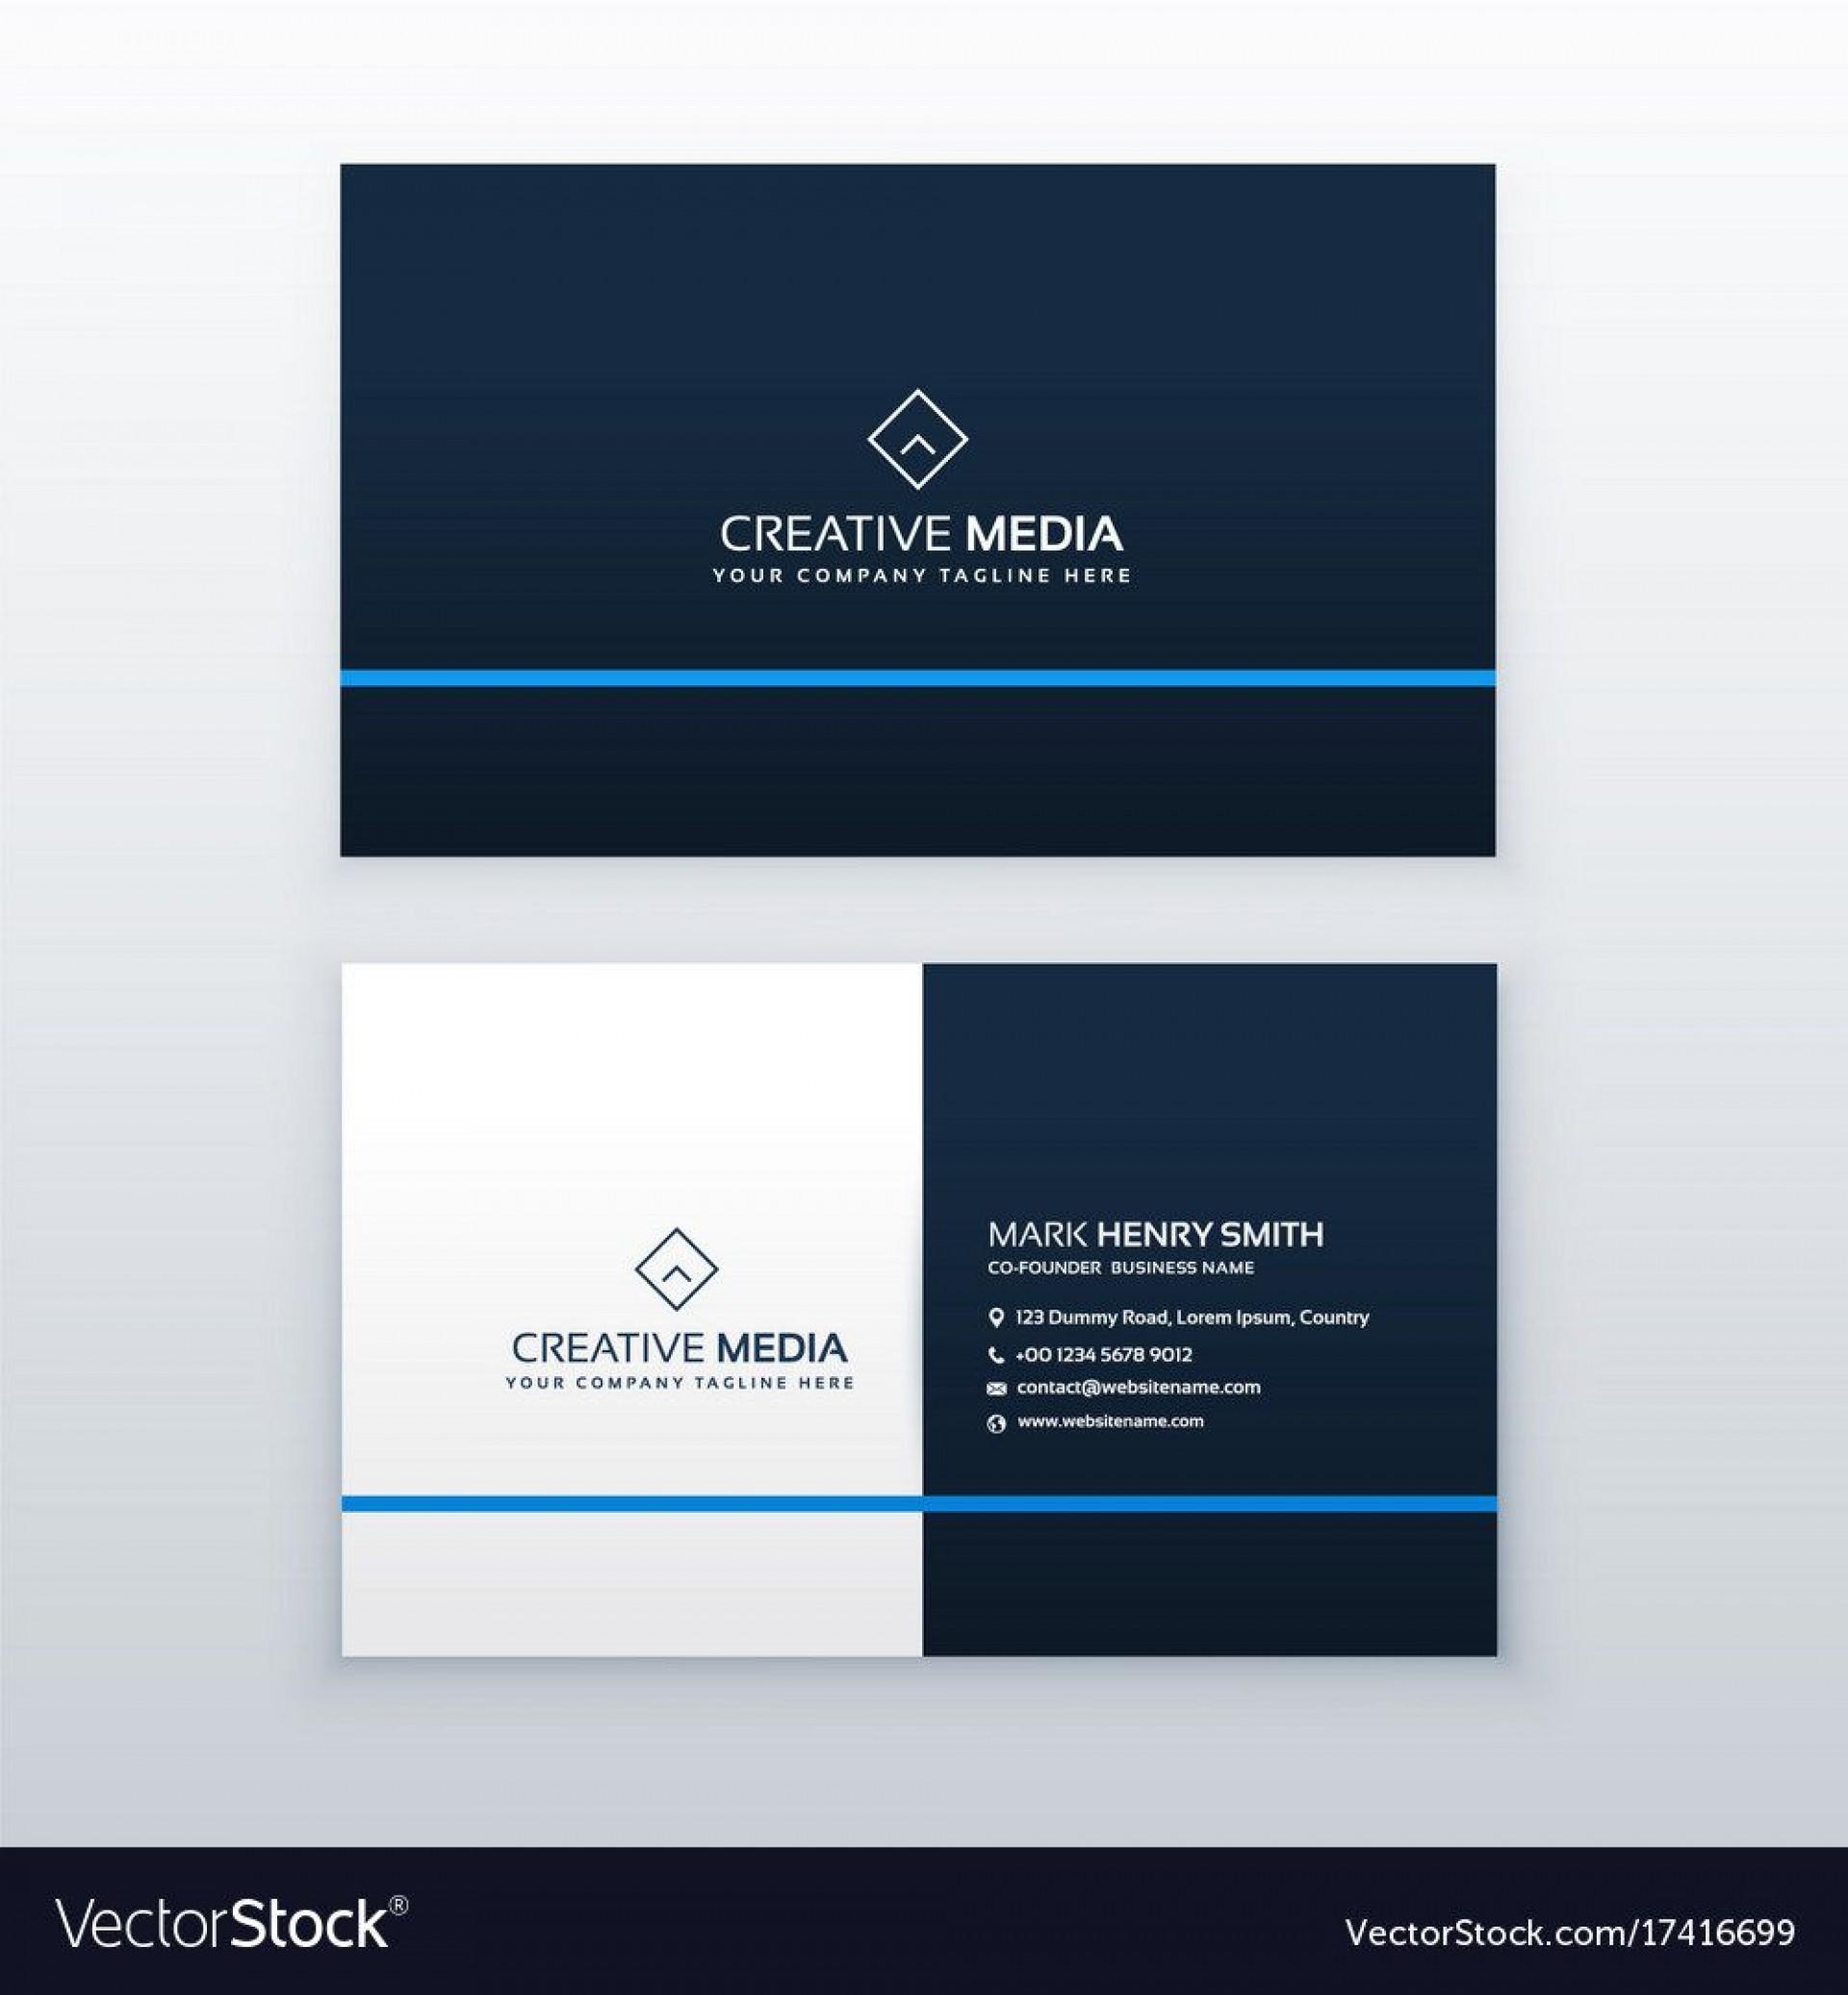 008 Best Simple Visiting Card Design Concept  Busines Idea Psd File Free Download1920